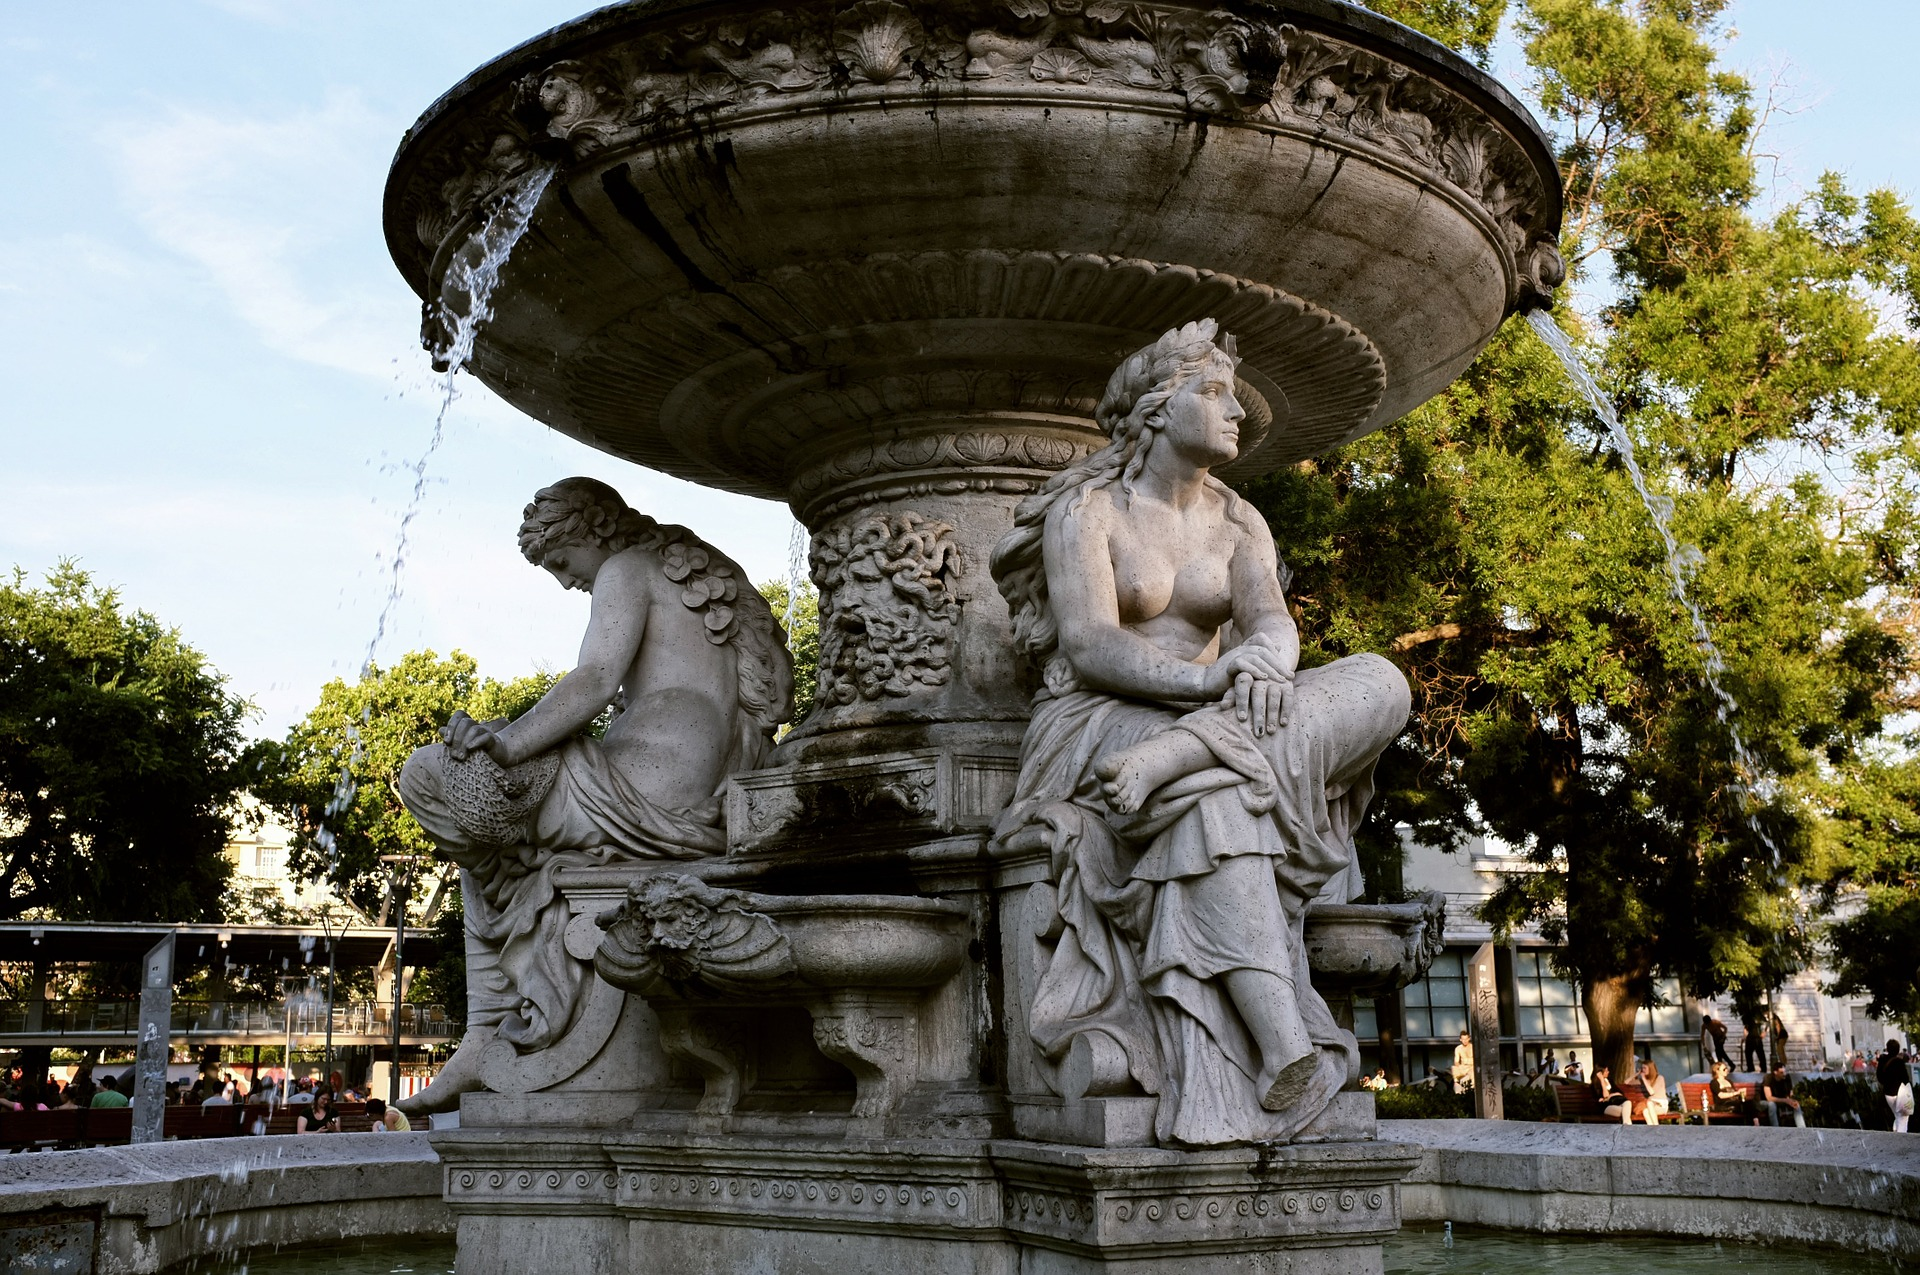 Brunnen Fountain in Budapest